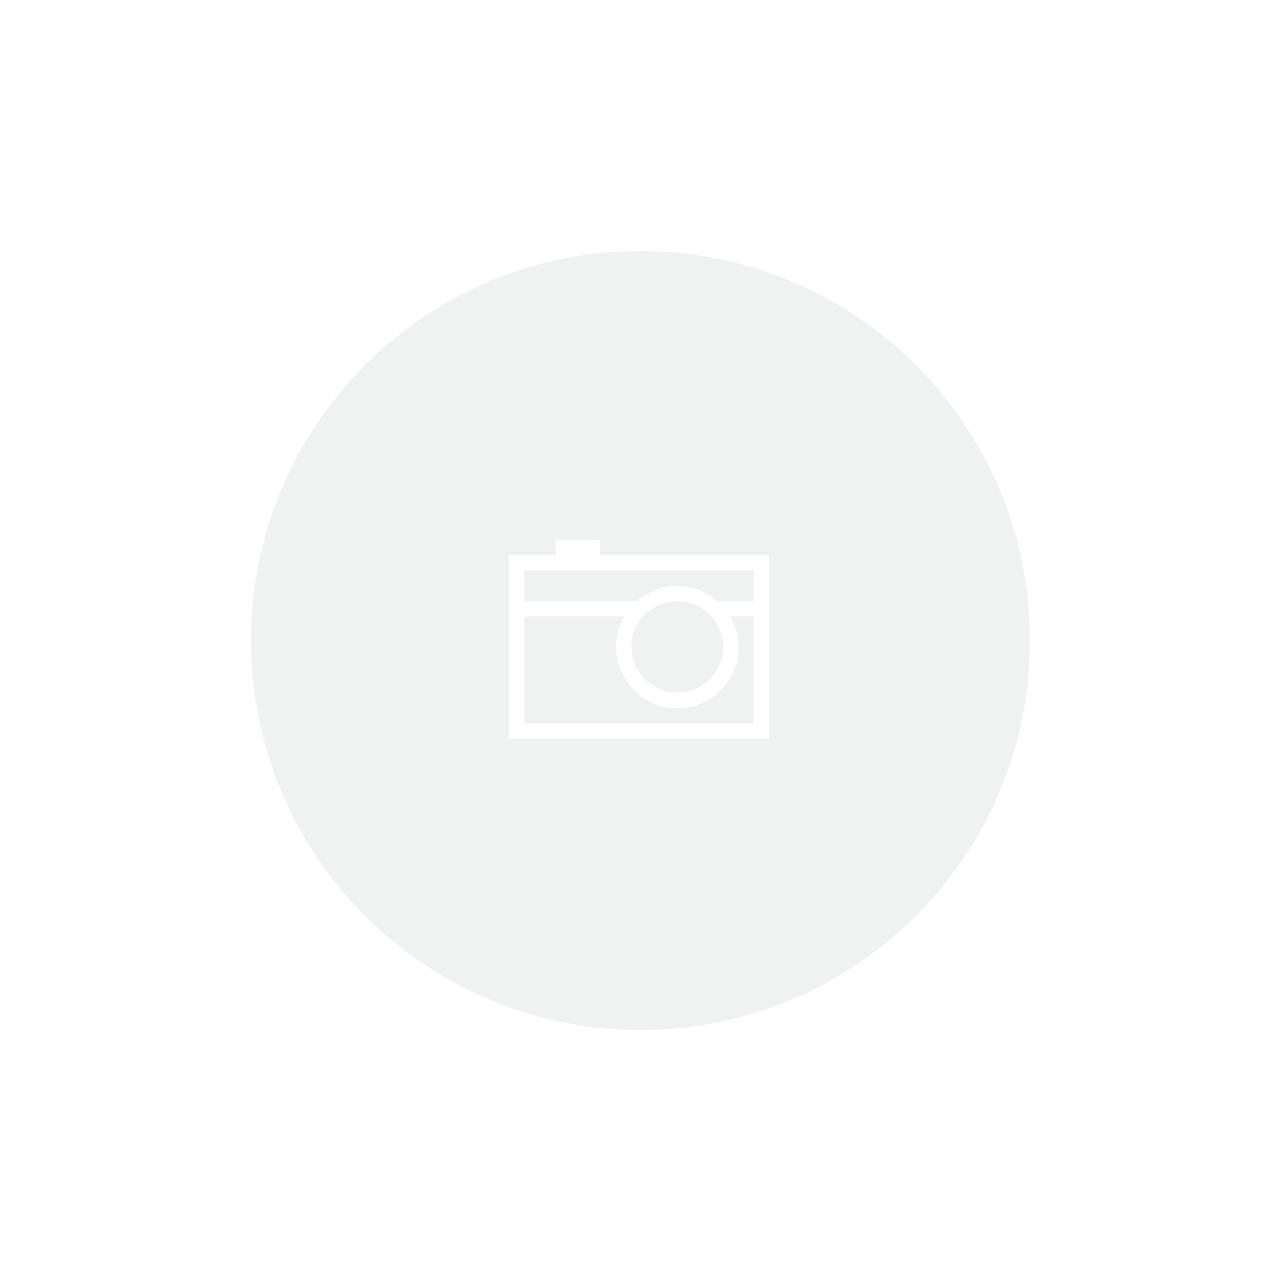 IMPRESSORA LASER MONO HP M102W